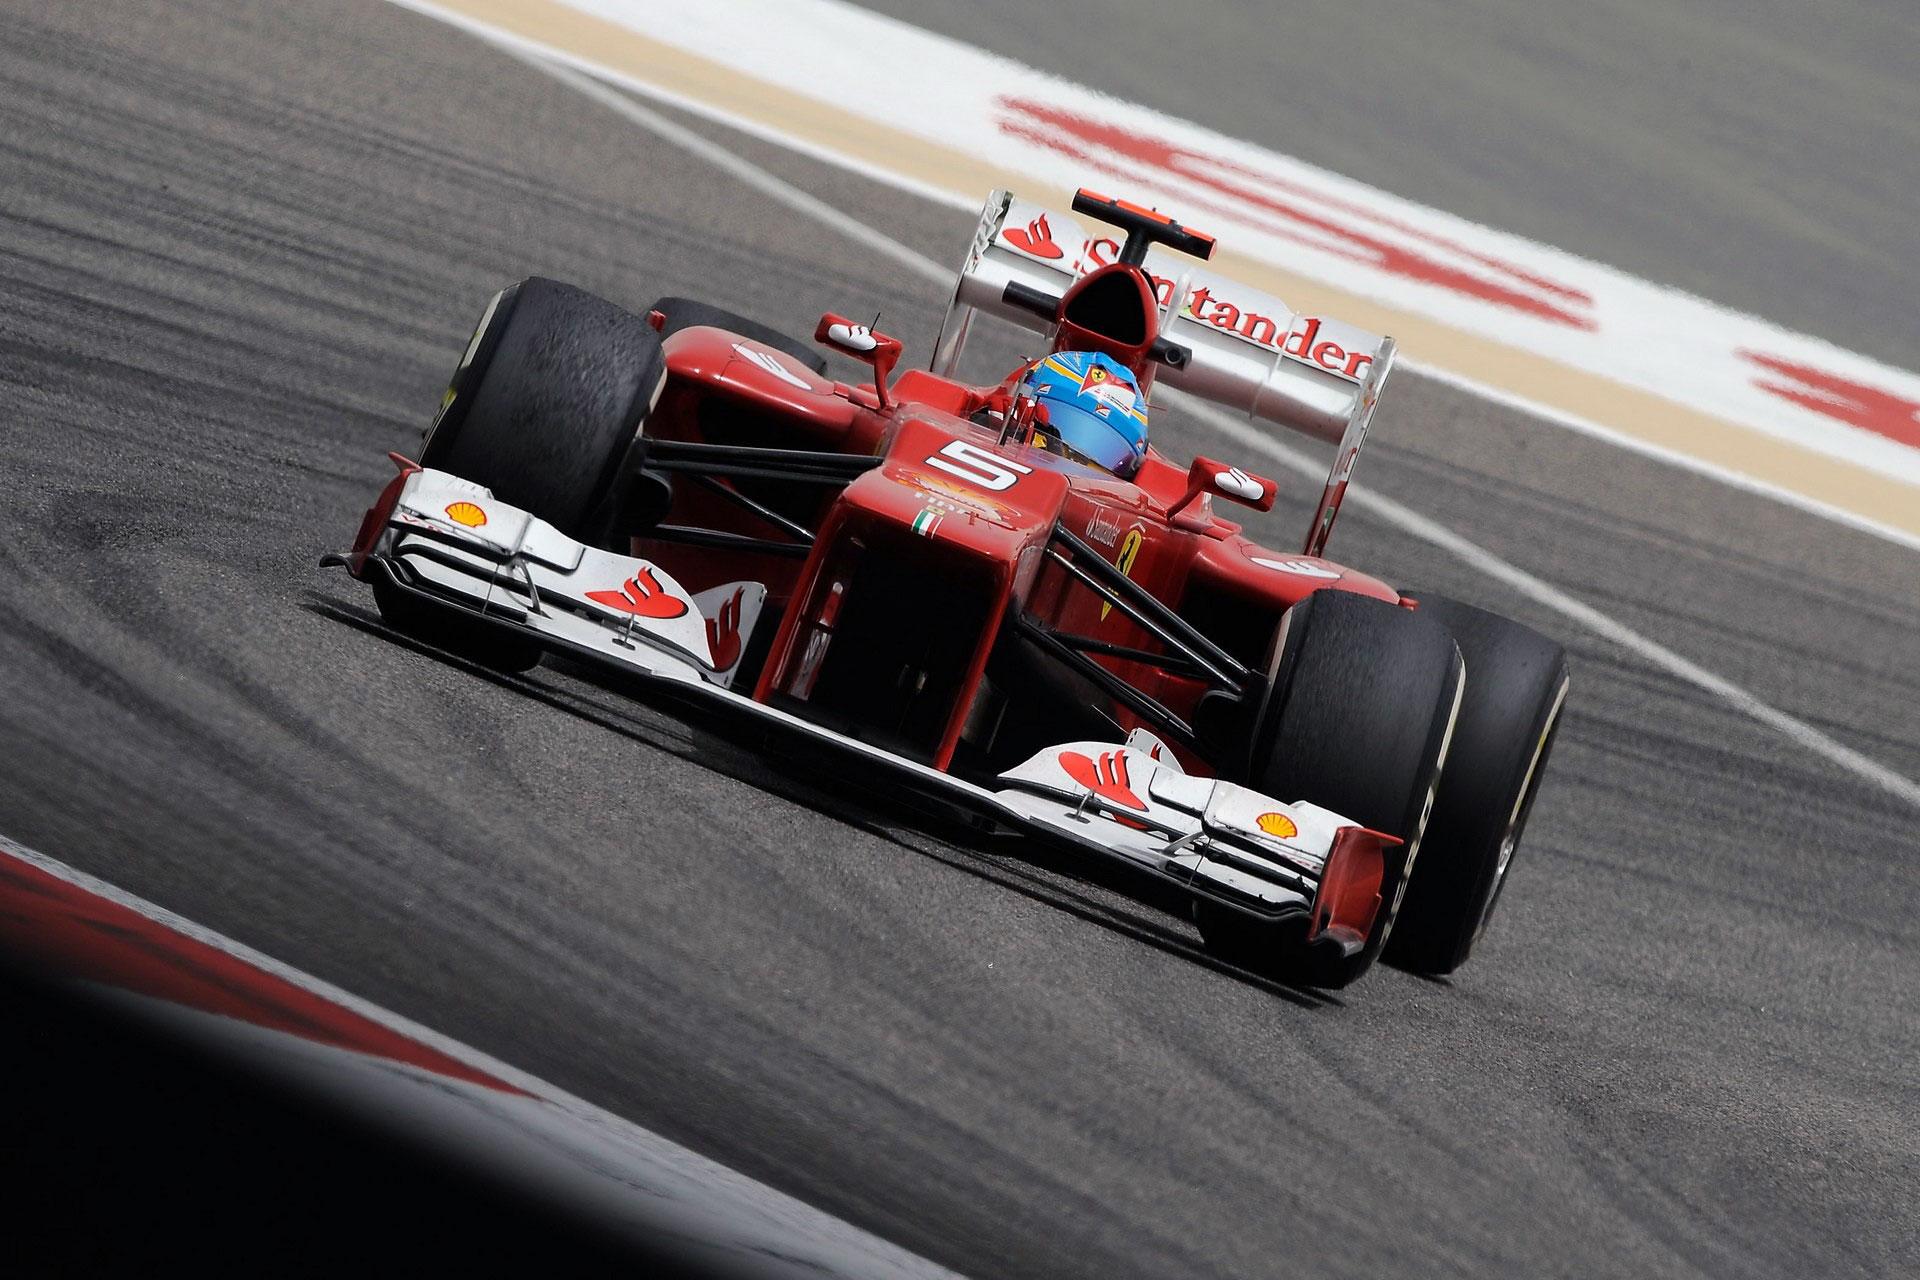 ferrari f1 championship